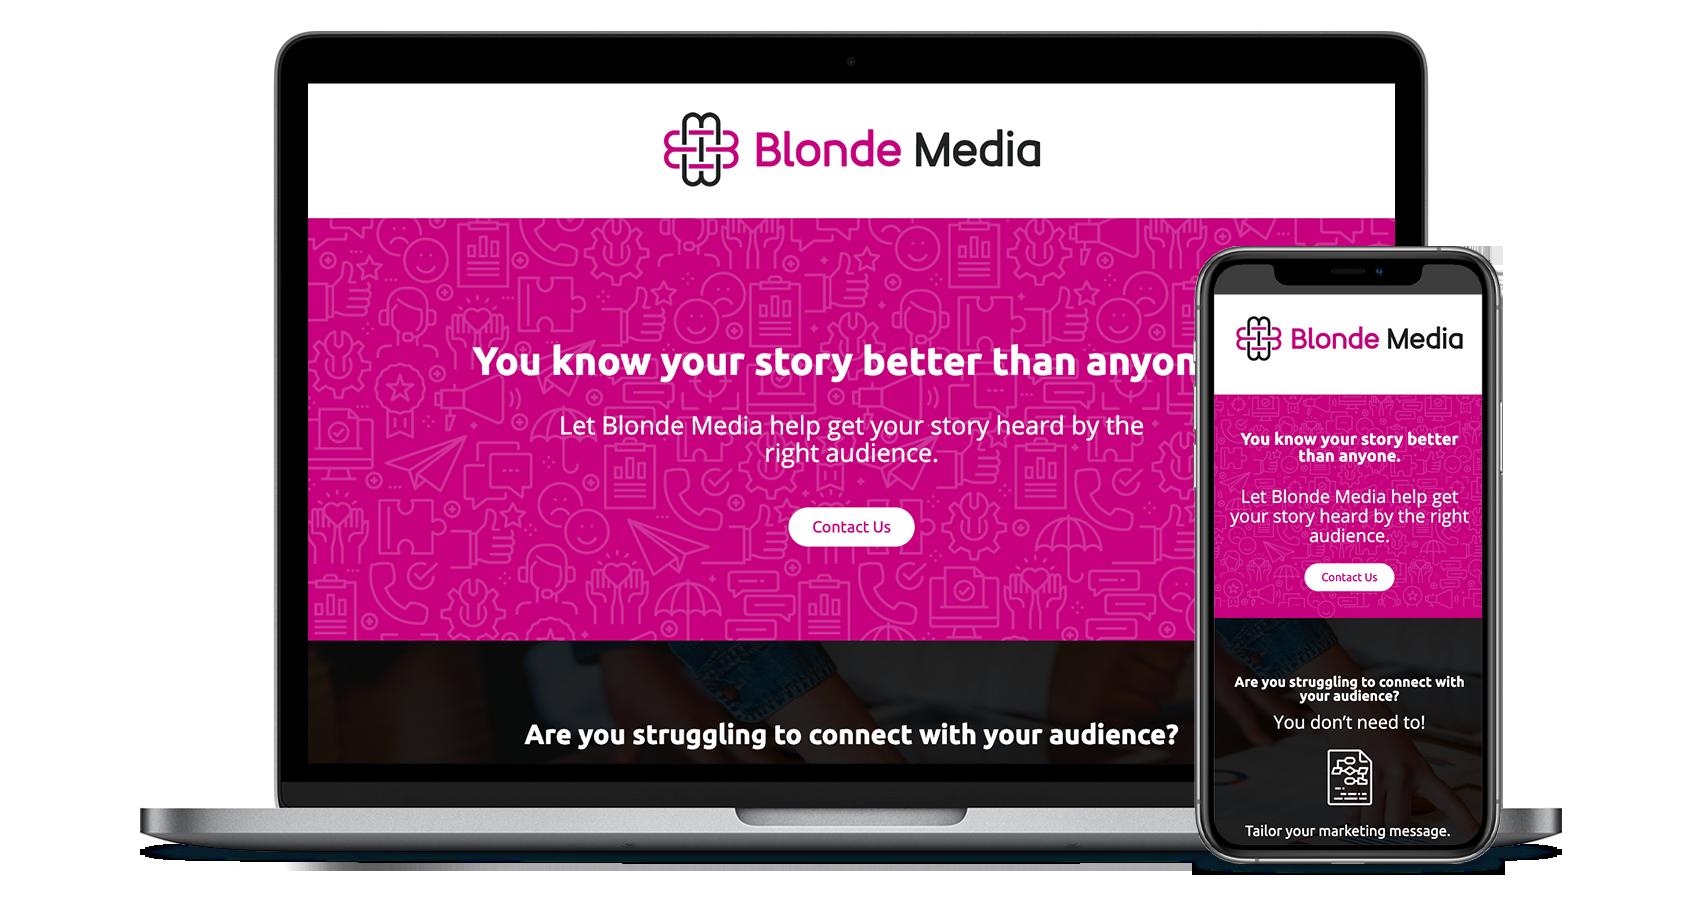 blonde-media-web-1